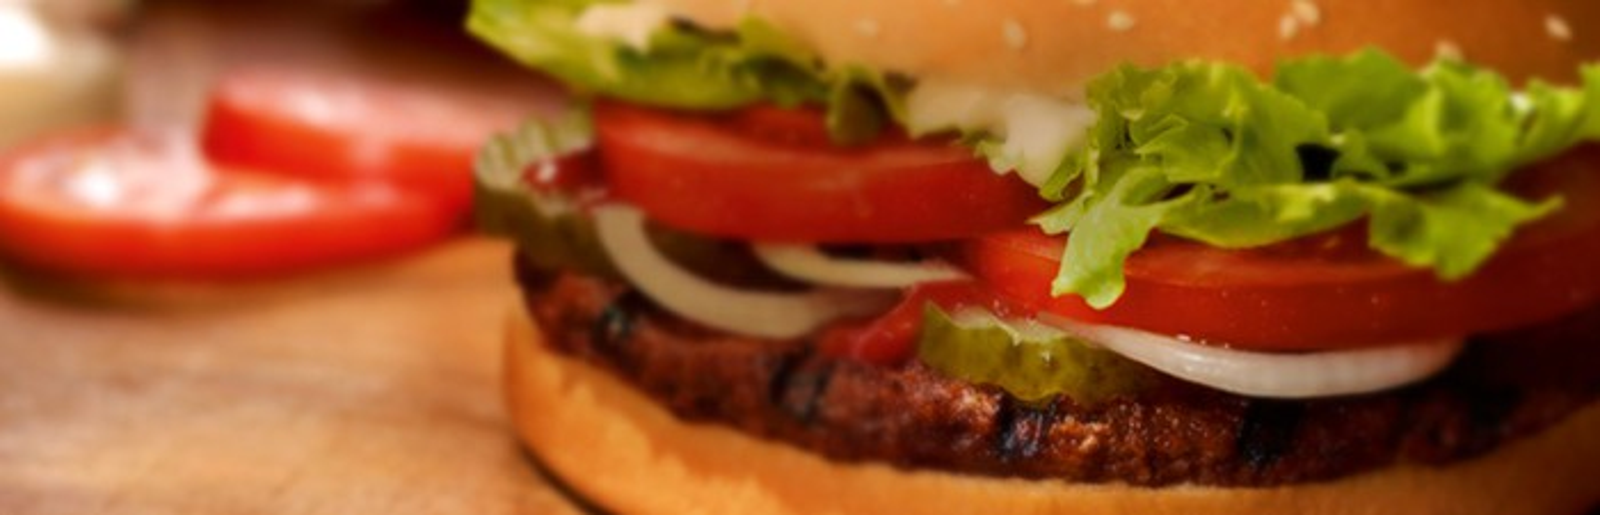 A close up of a Burger King Whopper sandwich.